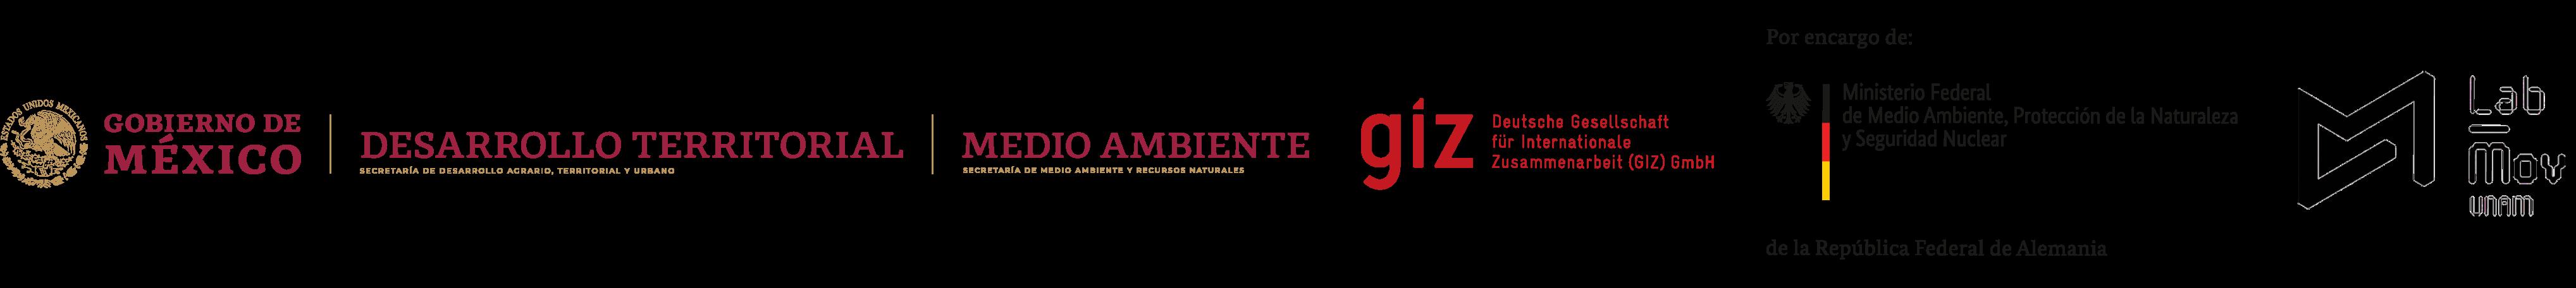 Logotipos de SEDATU, SEMARNAT, LabMov y GIZ